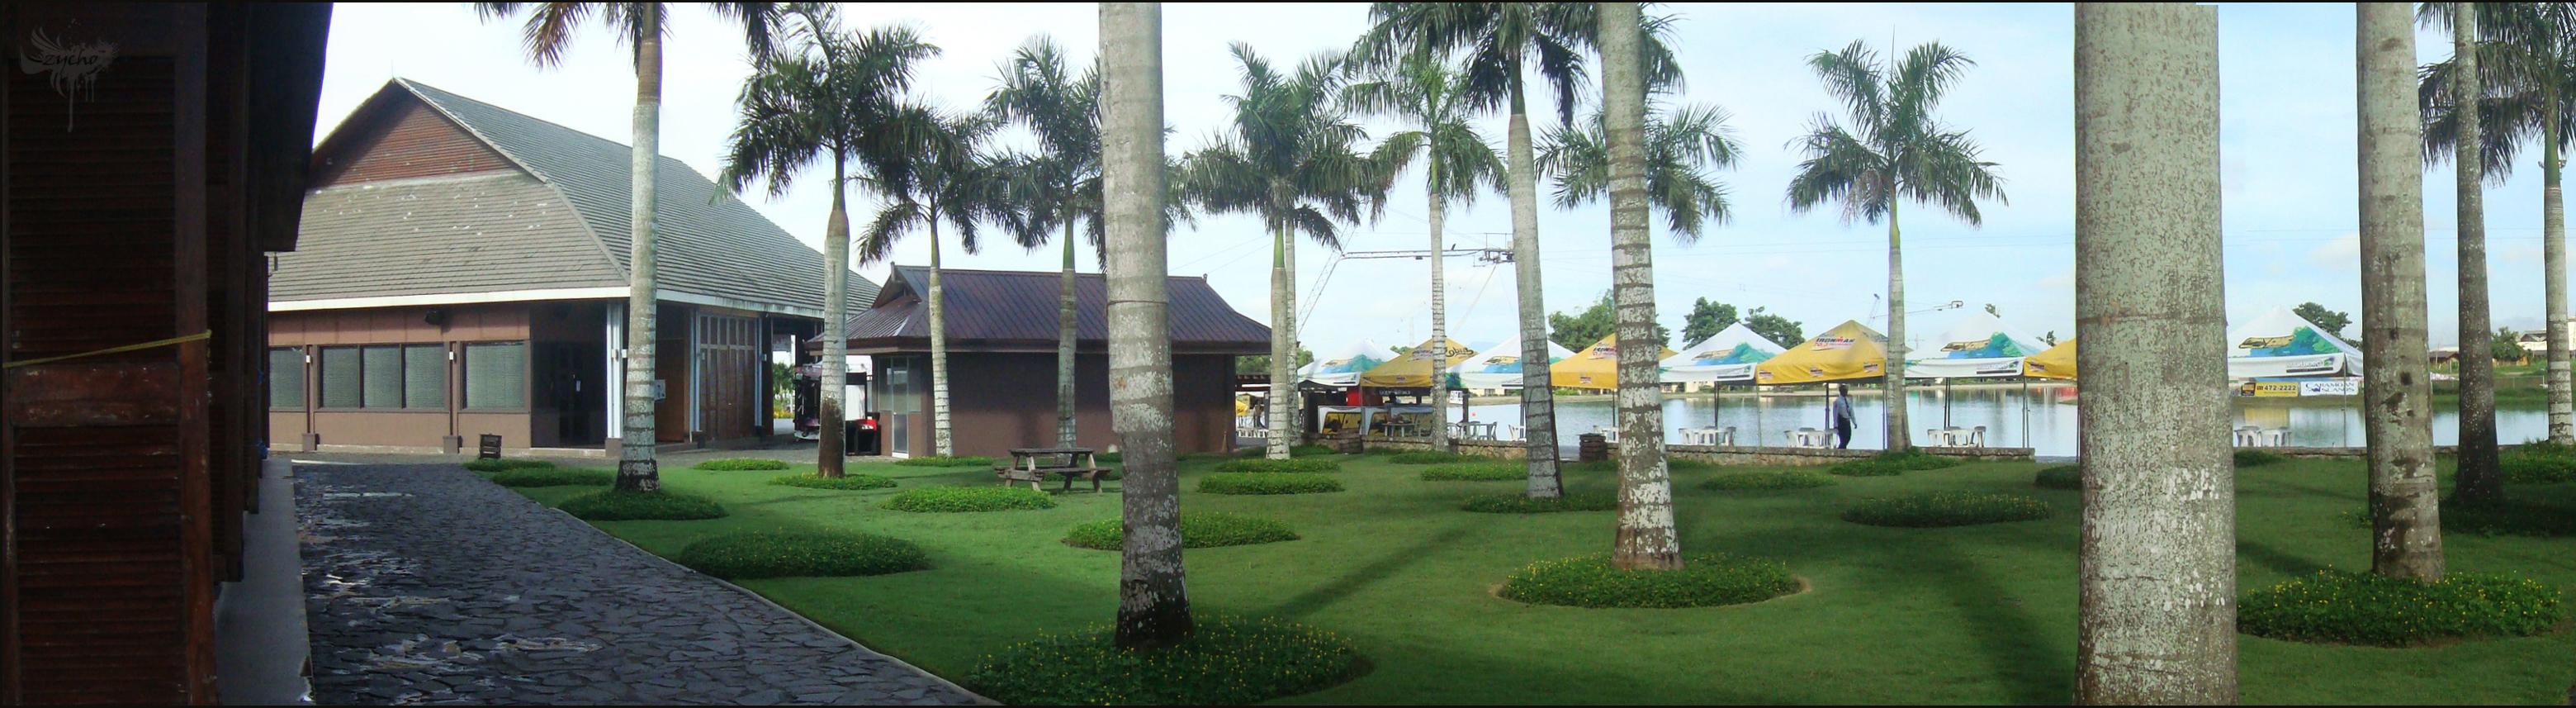 Panorama landscape photo